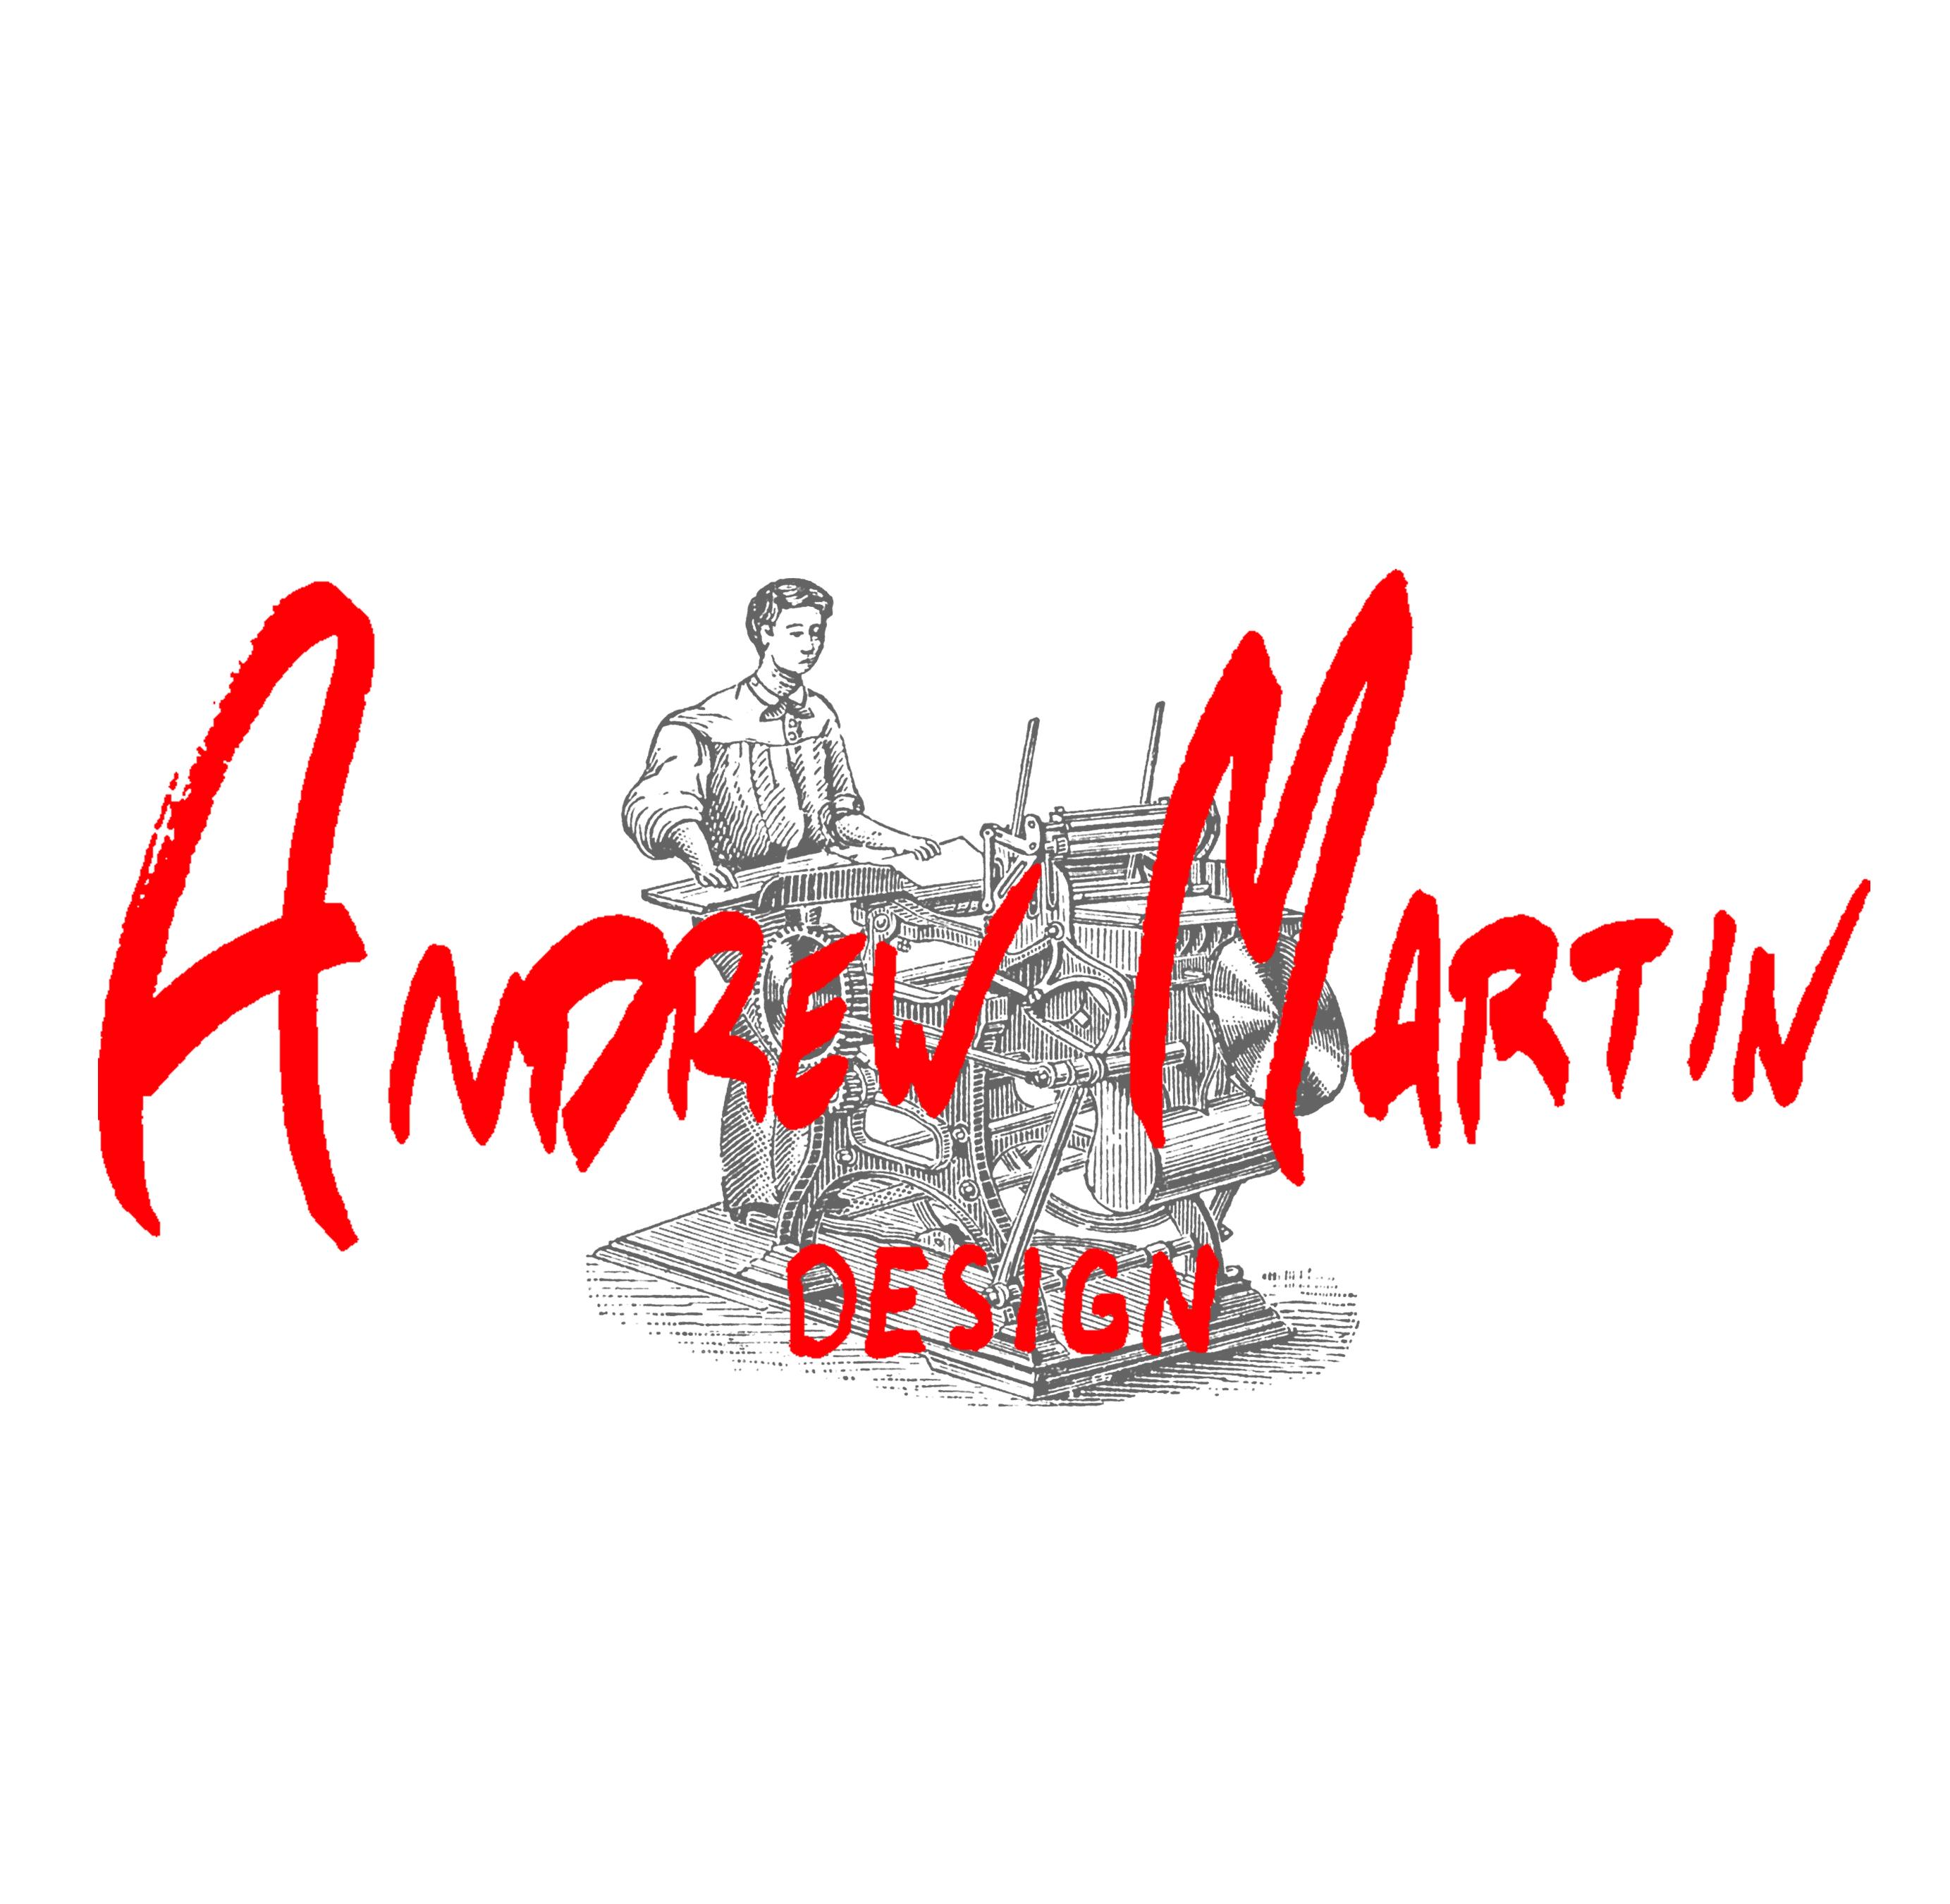 Andrew Graham Martin